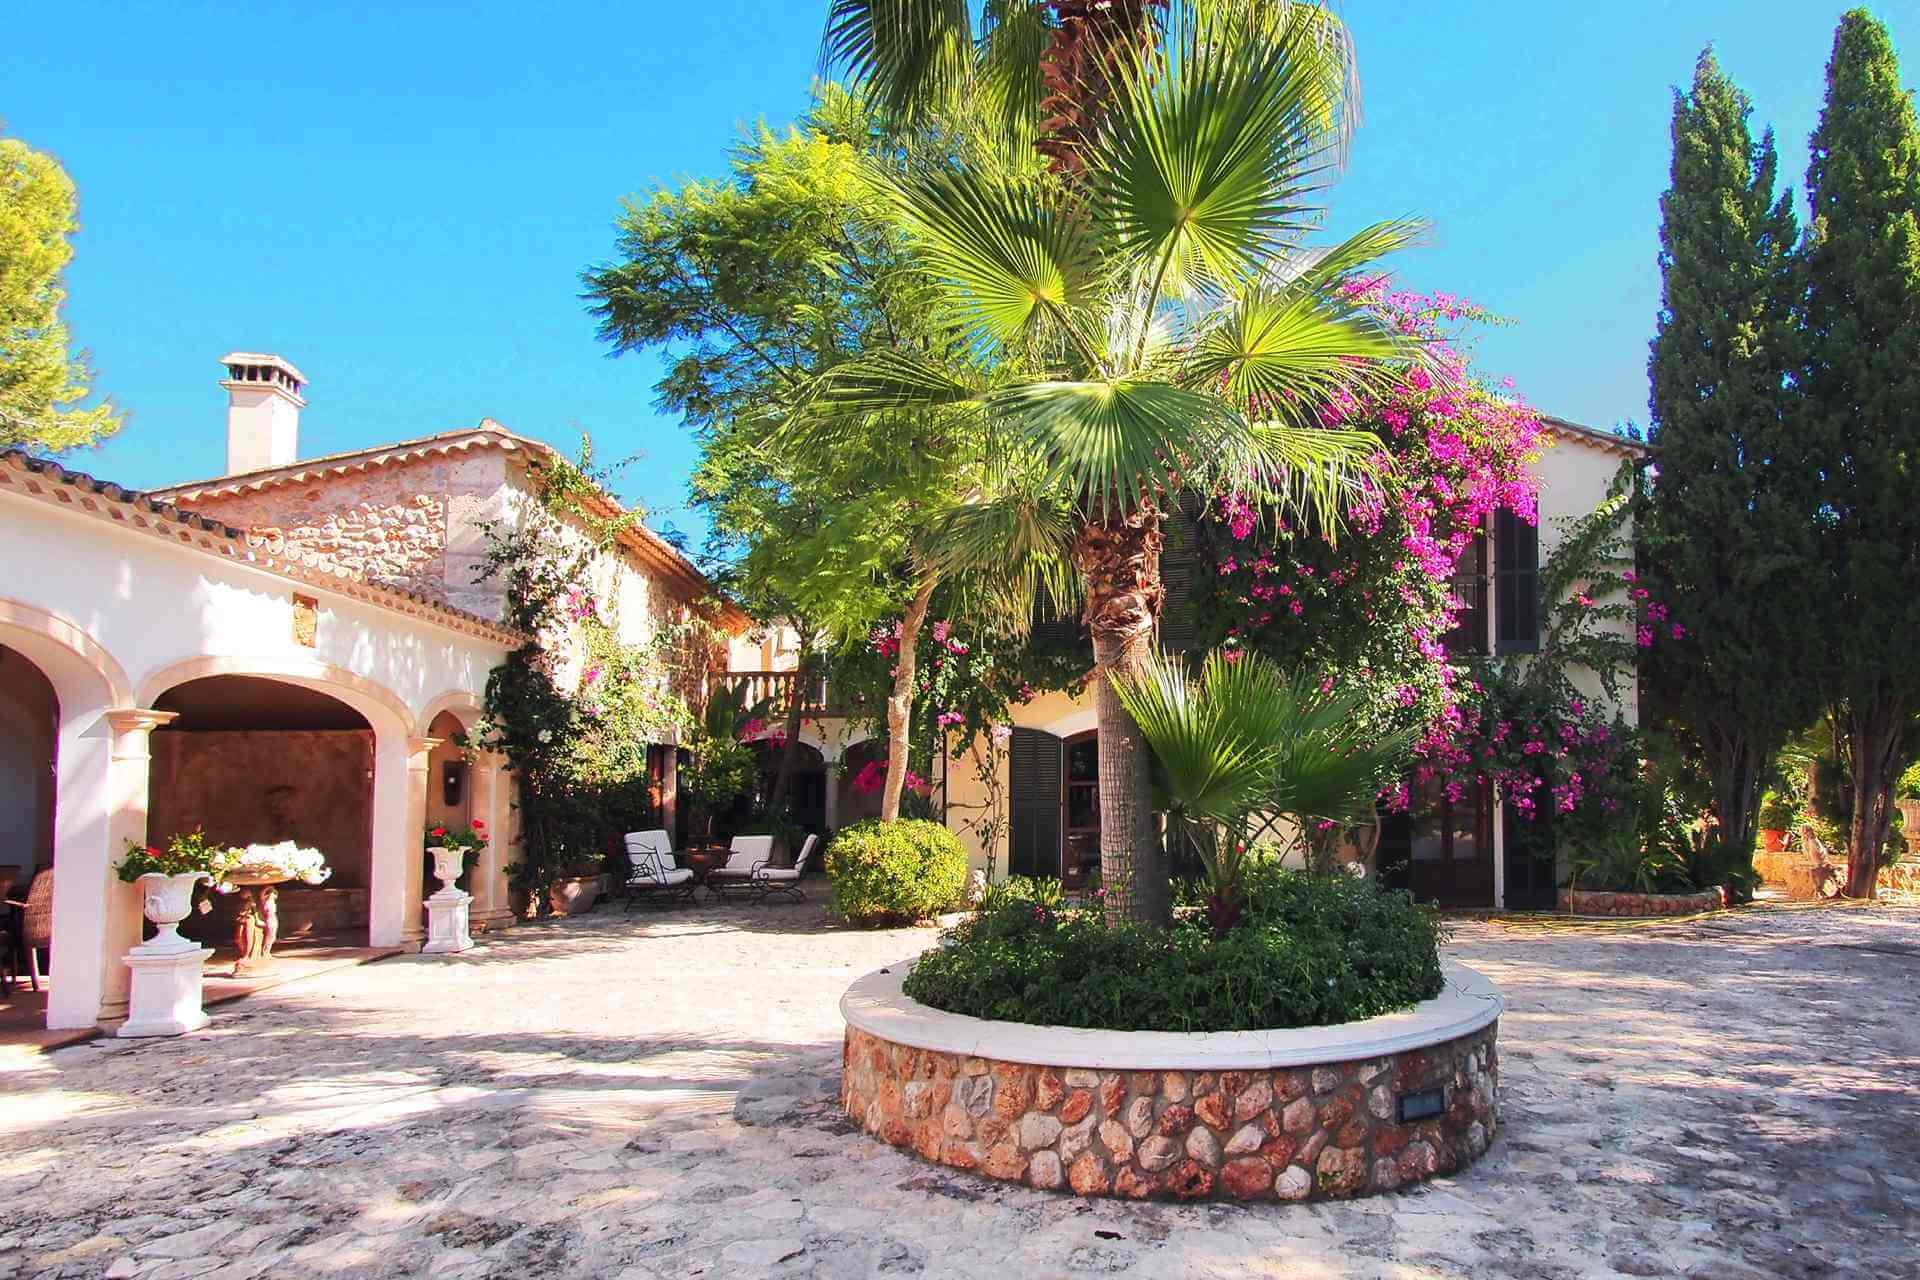 01-87 Luxuriöse Finca Mallorca Zentrum Bild 2